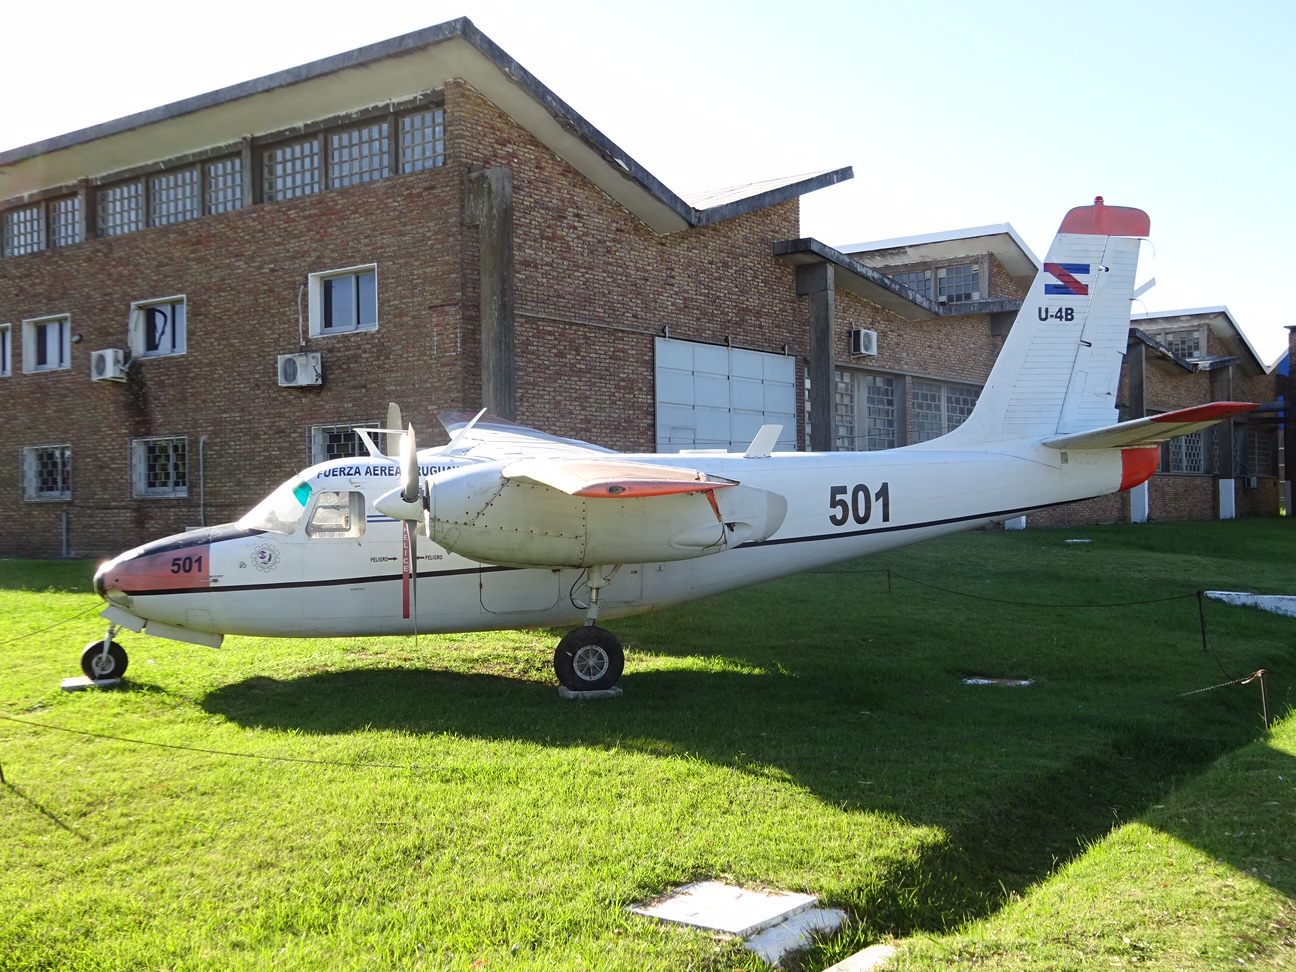 Museo Aeronáutico Montevideo, Uruguay - www aviationmuseum eu